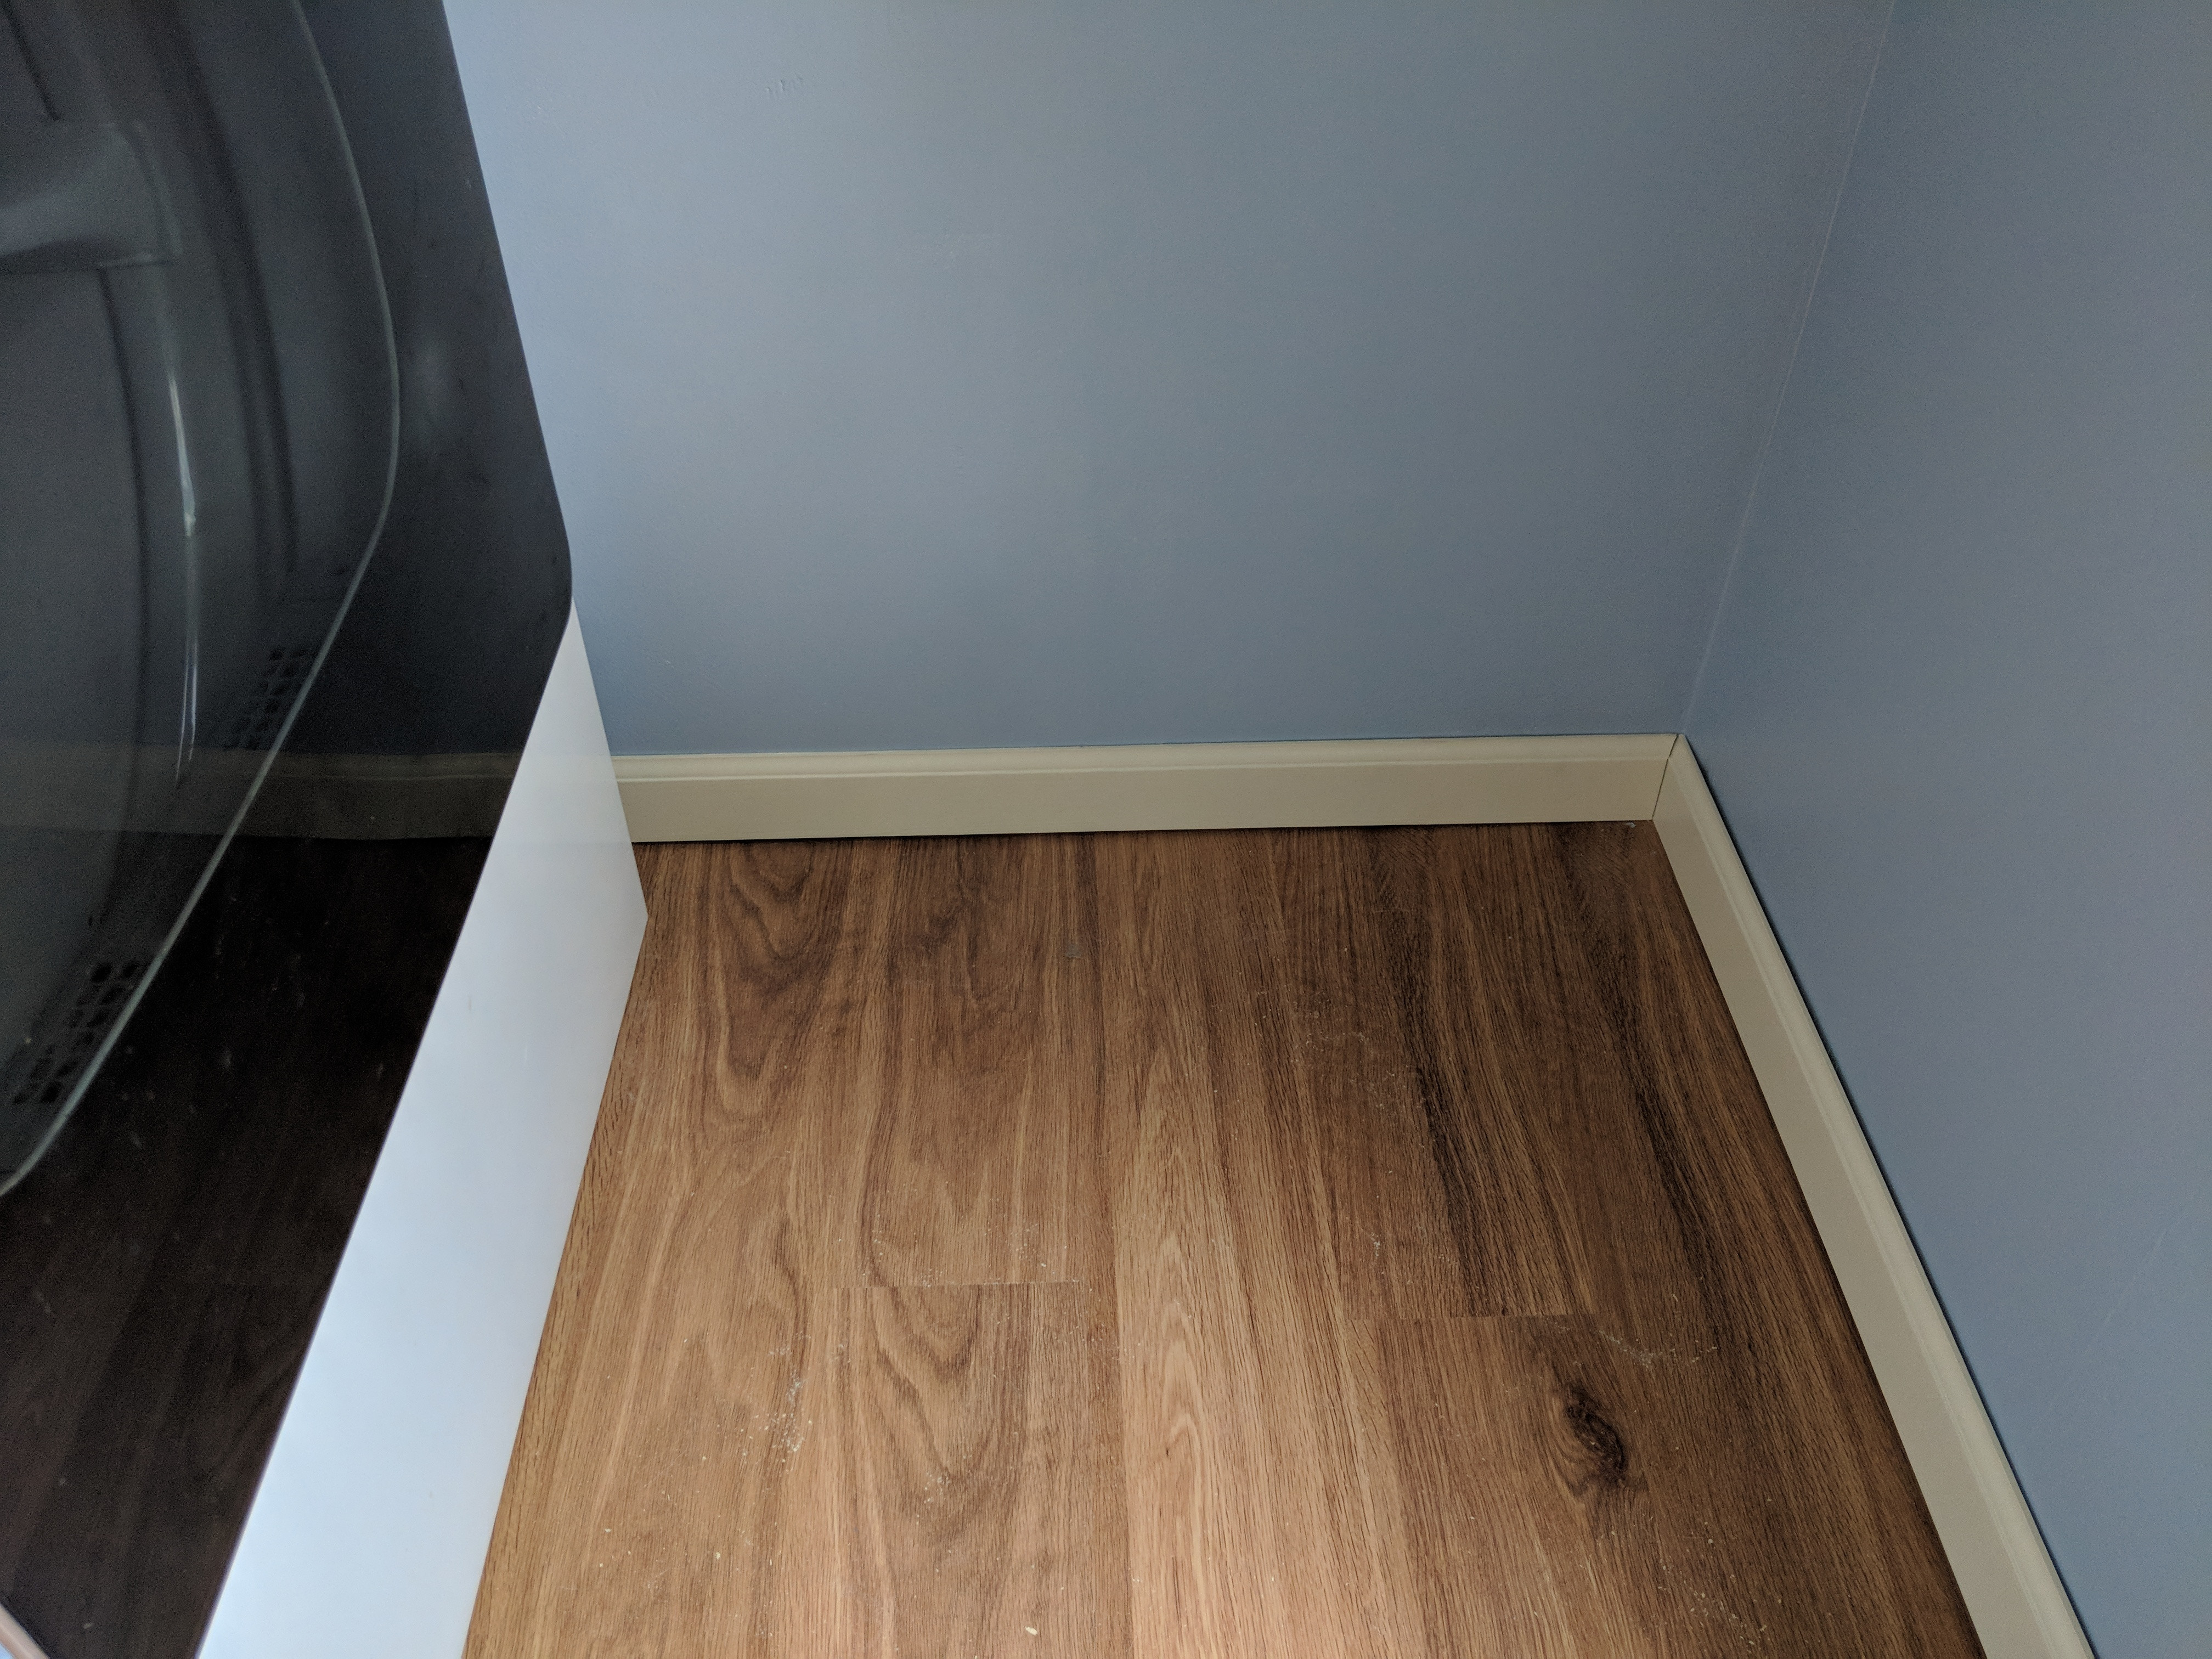 aa hardwood flooring charlotte nc of https imgur com gallery kokvx7q daily https imgur com kokvx7q in usbjxyq